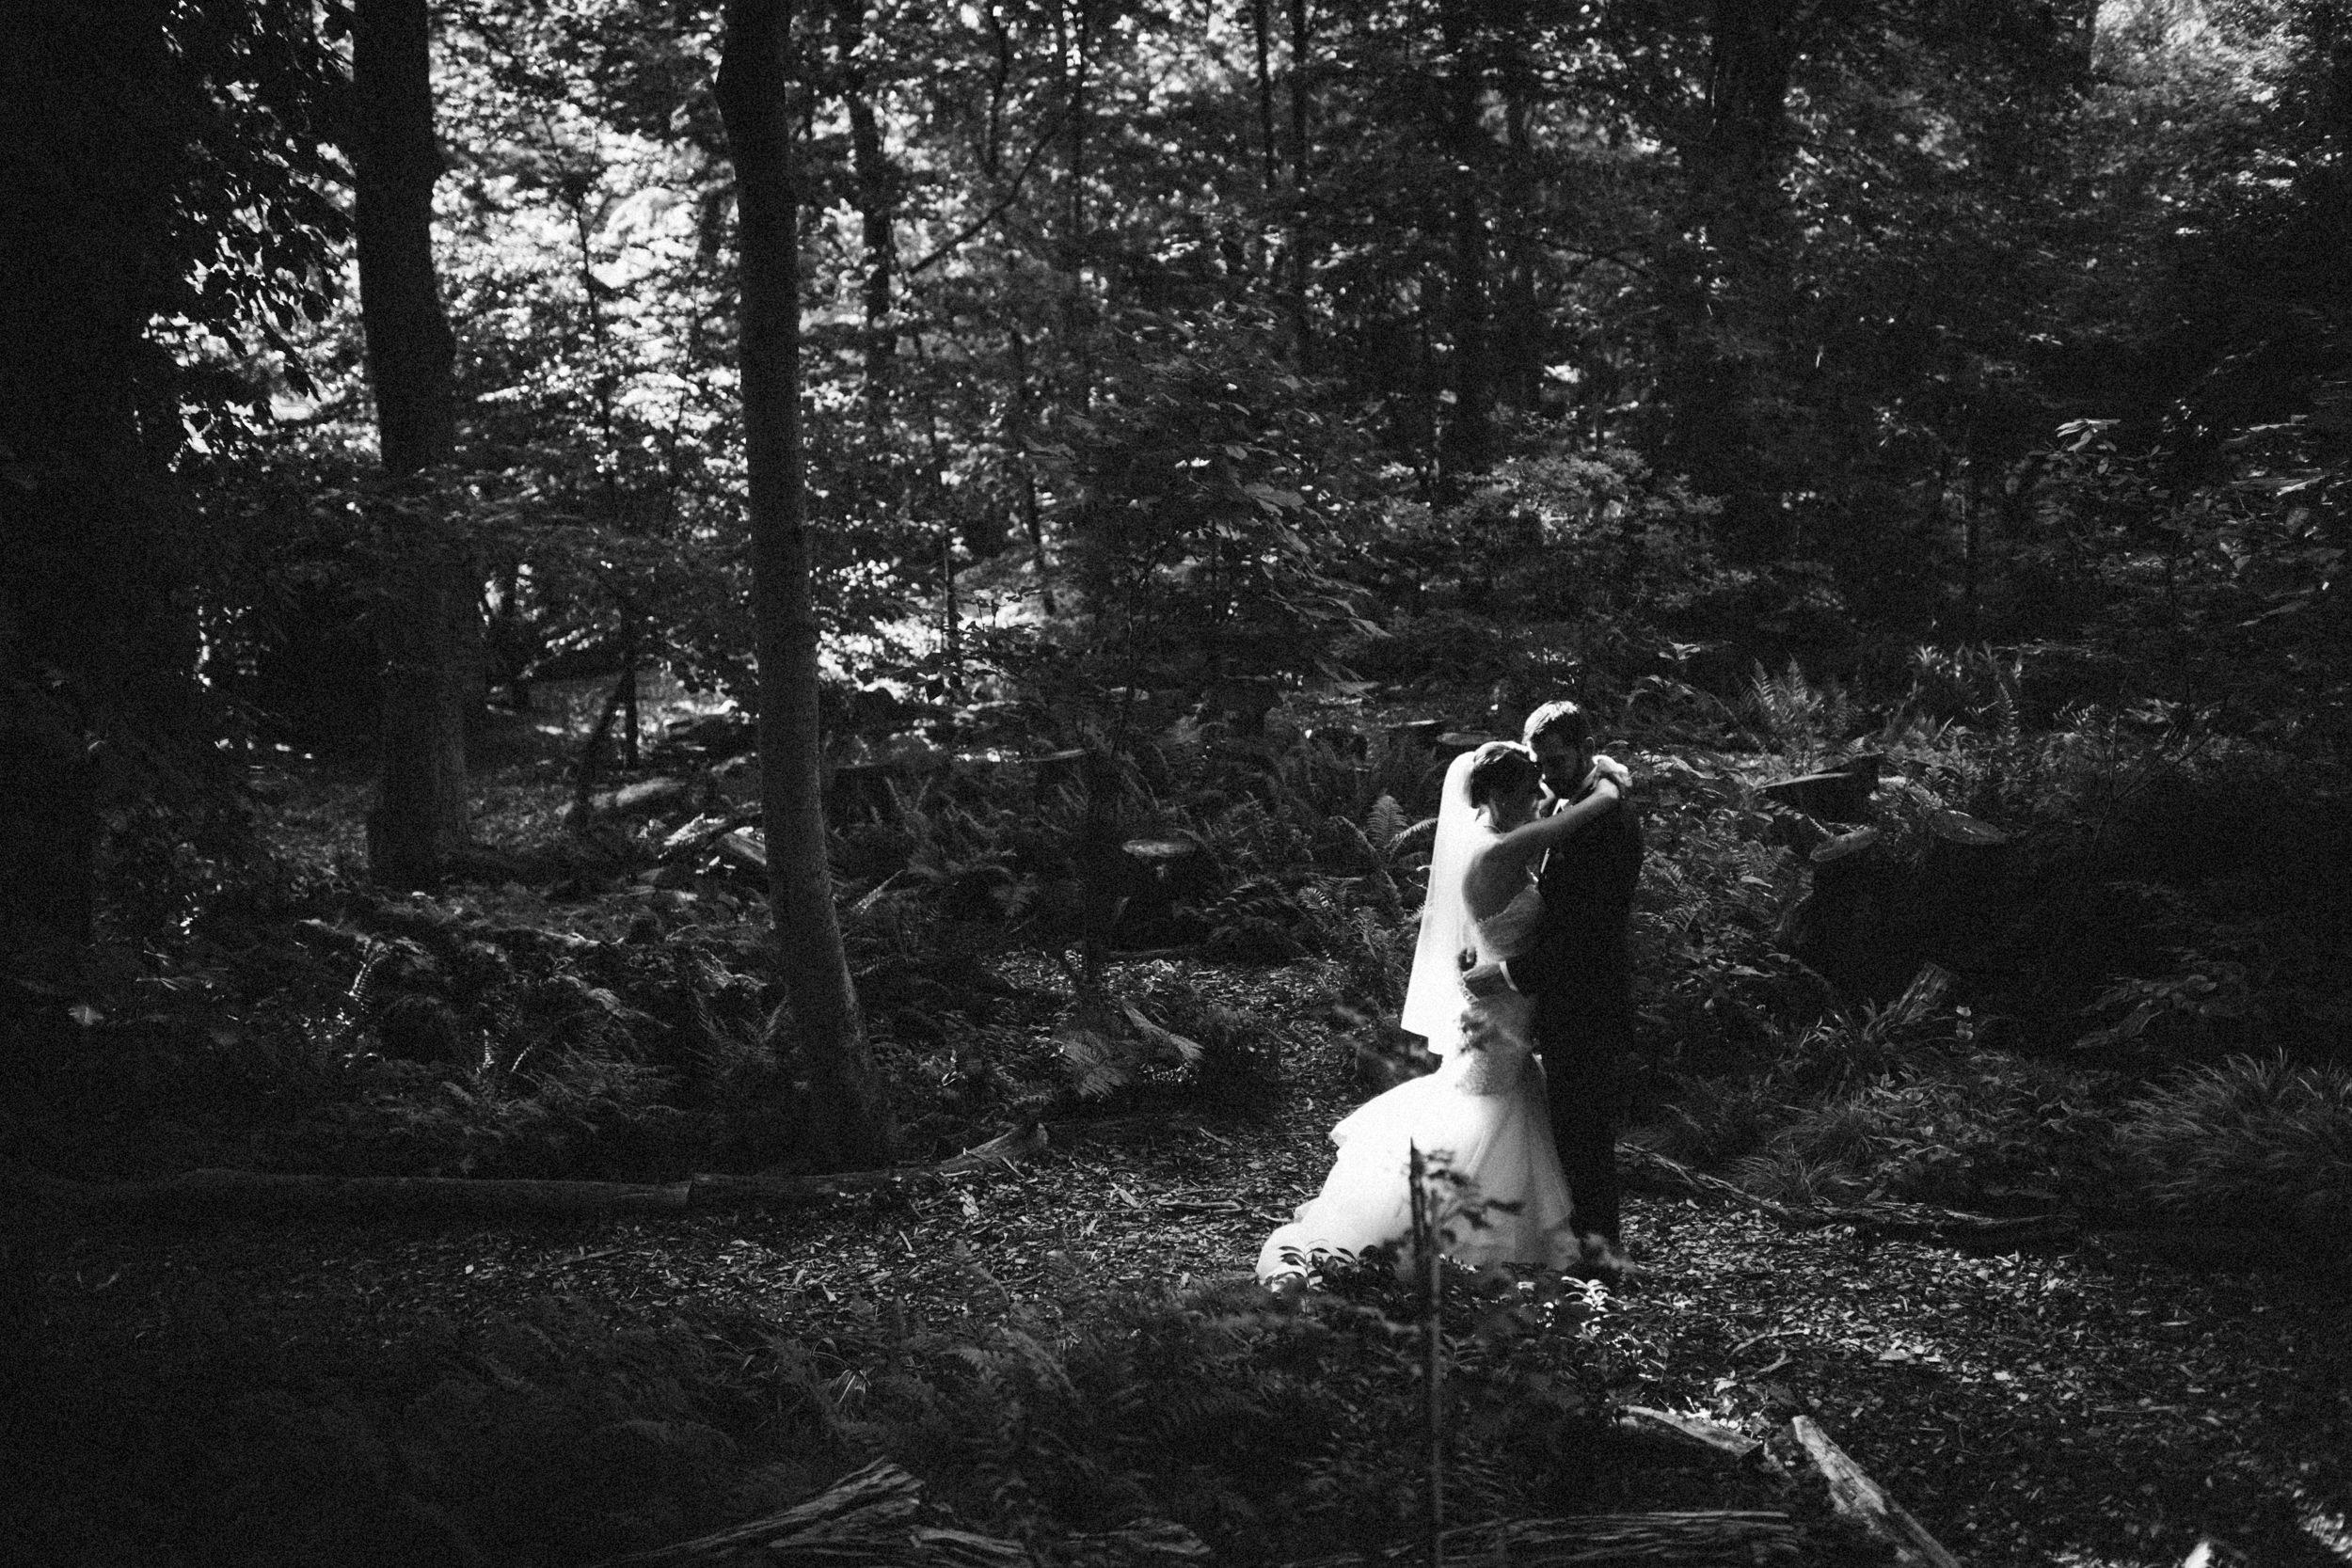 Louisville-Kentucky-Wedding-Elopement-Photographer-Sarah-Katherine-Davis-Photography-Whitehall-Classic-Timeless-Garden-Wedding-521.jpg